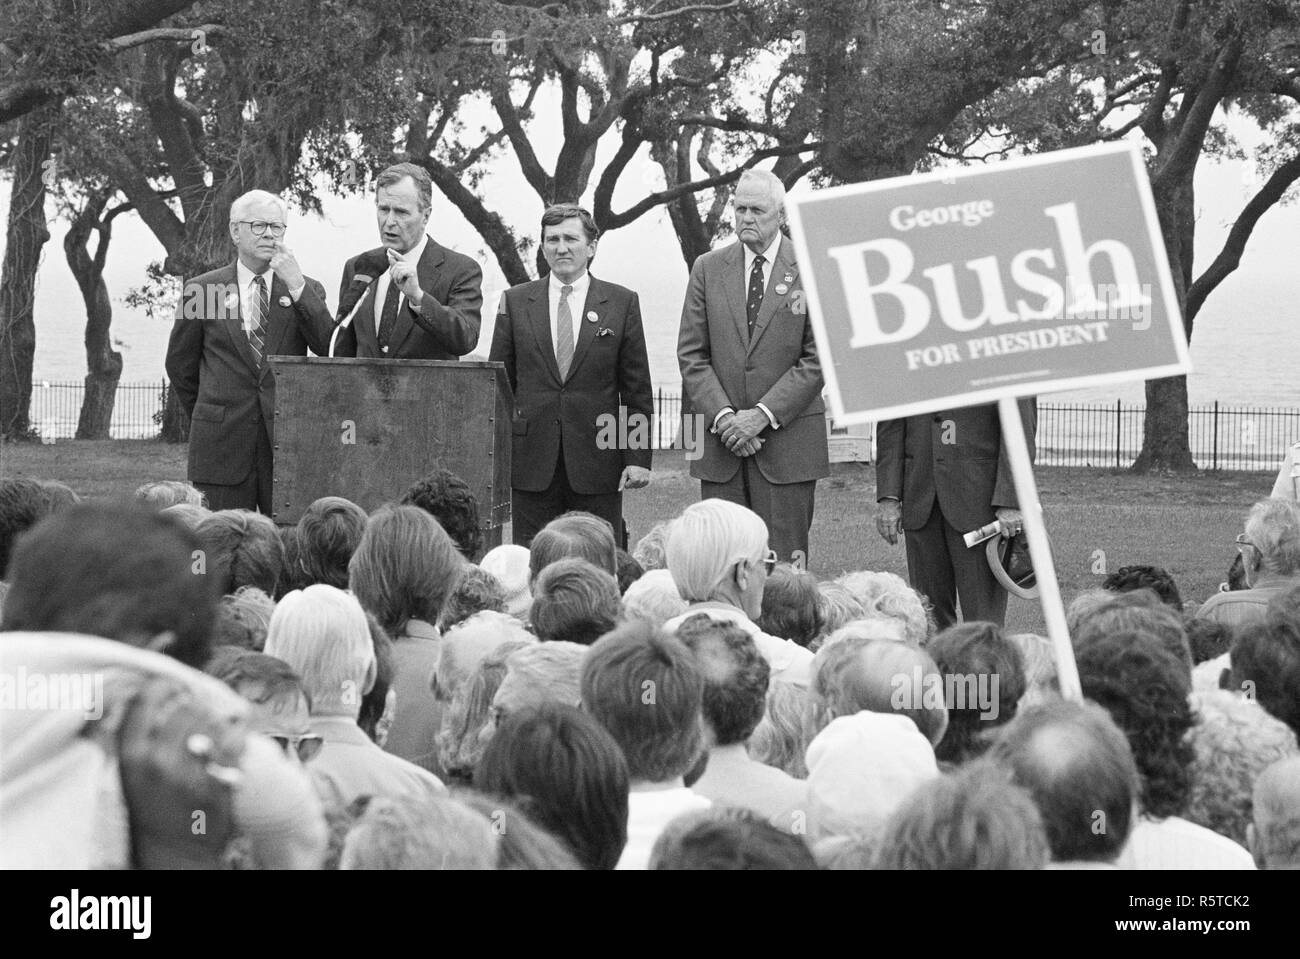 George HW Bush - Pictures taken 1988 - Died Nov 20118 - Stock Image